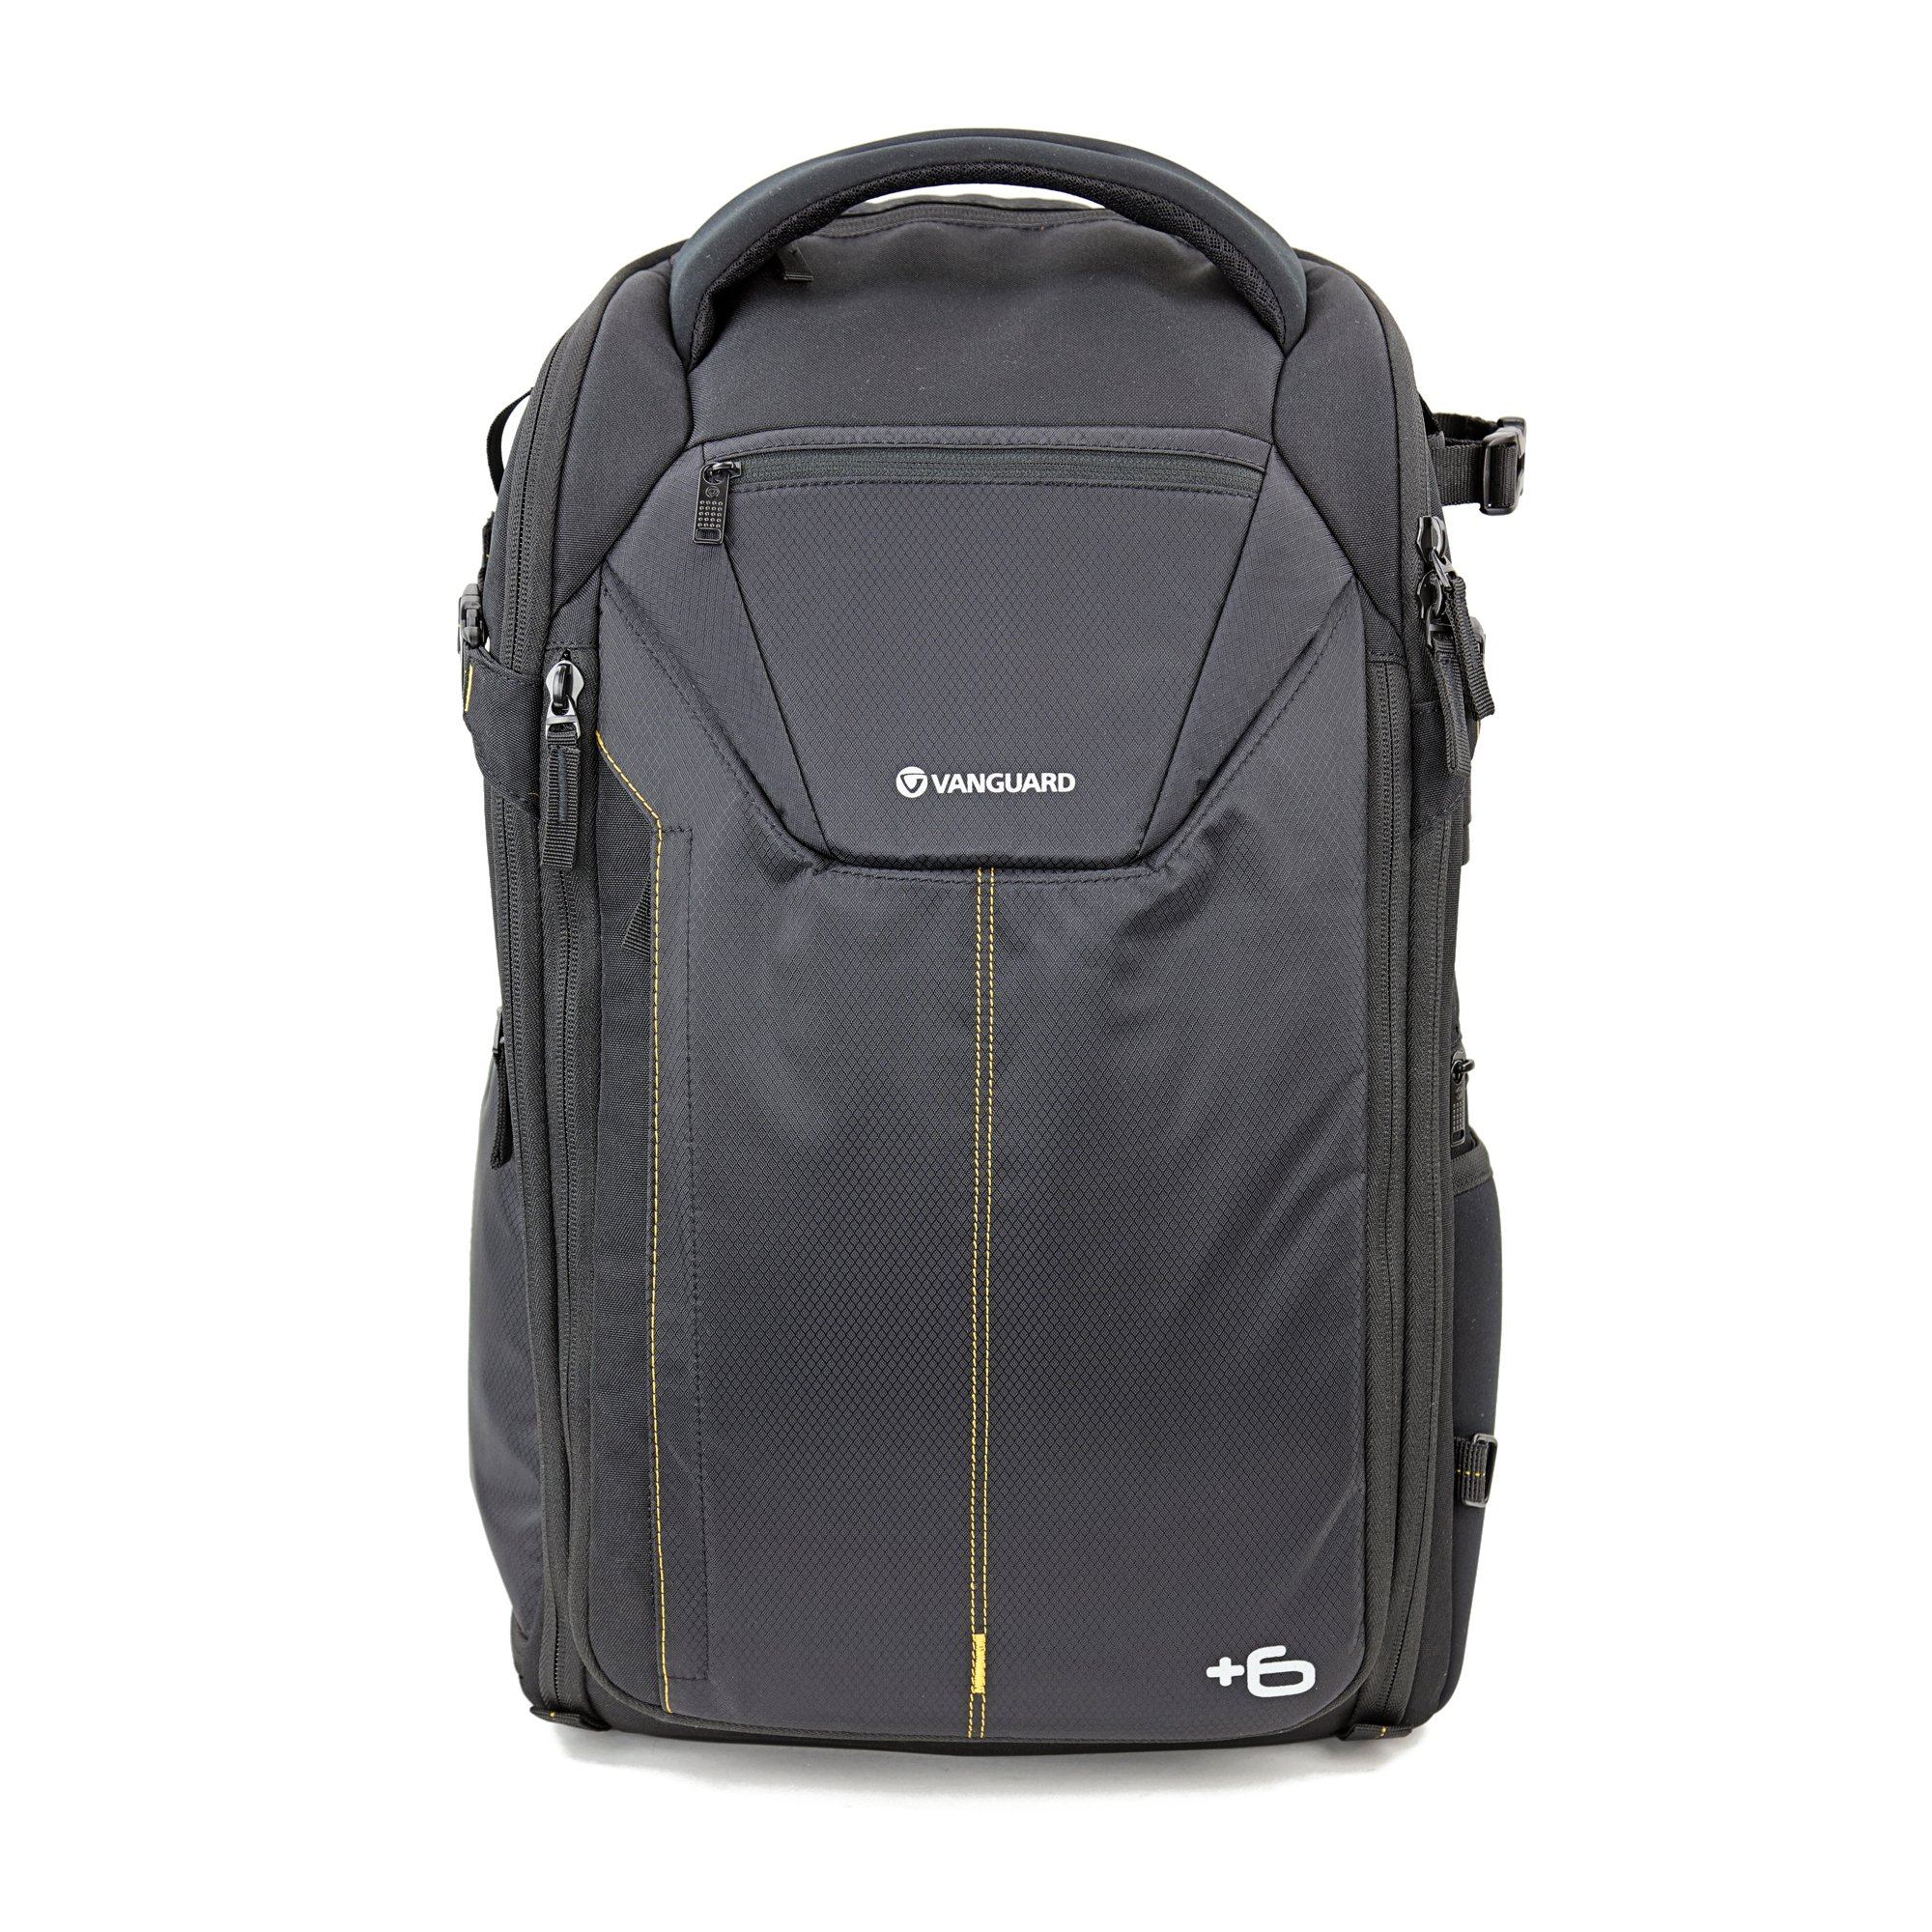 VANGUARD Alta Rise Backpack, Black (Alta Rise 48)